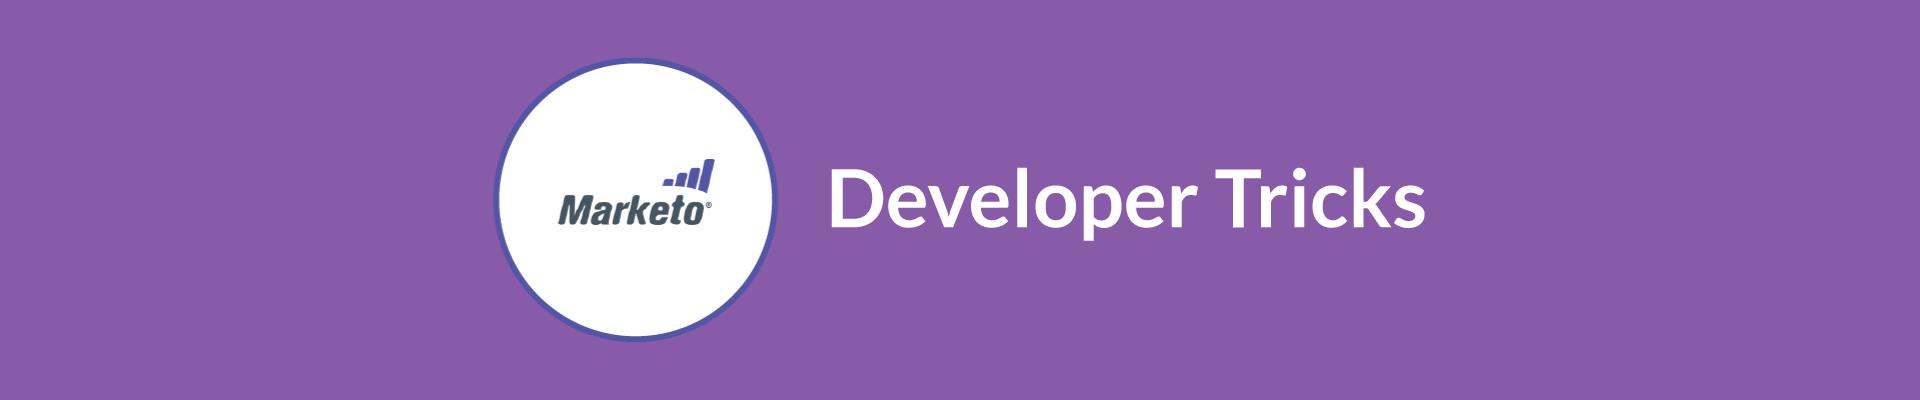 Marketo API Integration